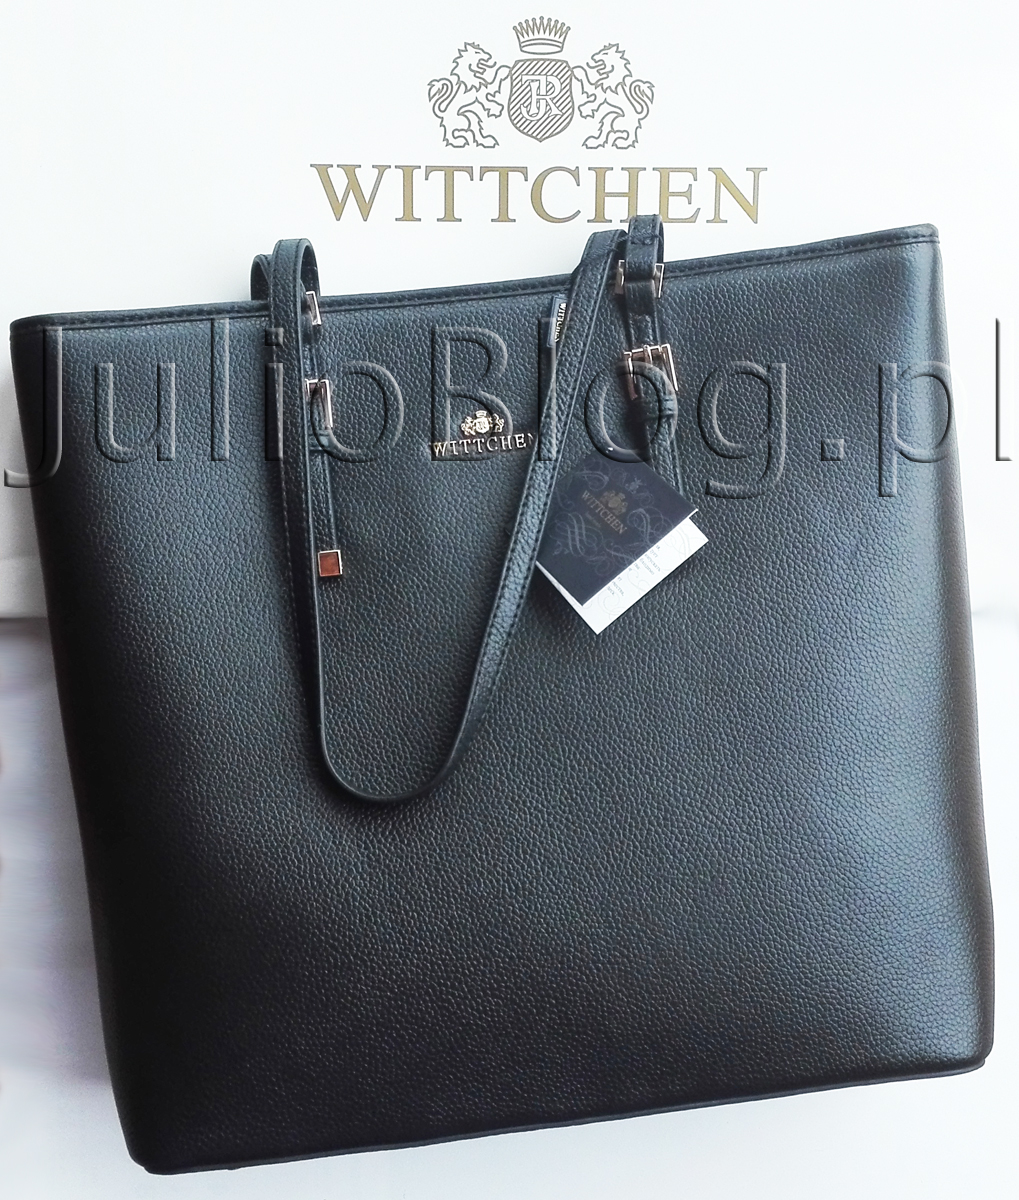 2b4845e6a6516 Czarna torebka Wittchen 82-4-404-1 ze skóry, Lidl 269zł